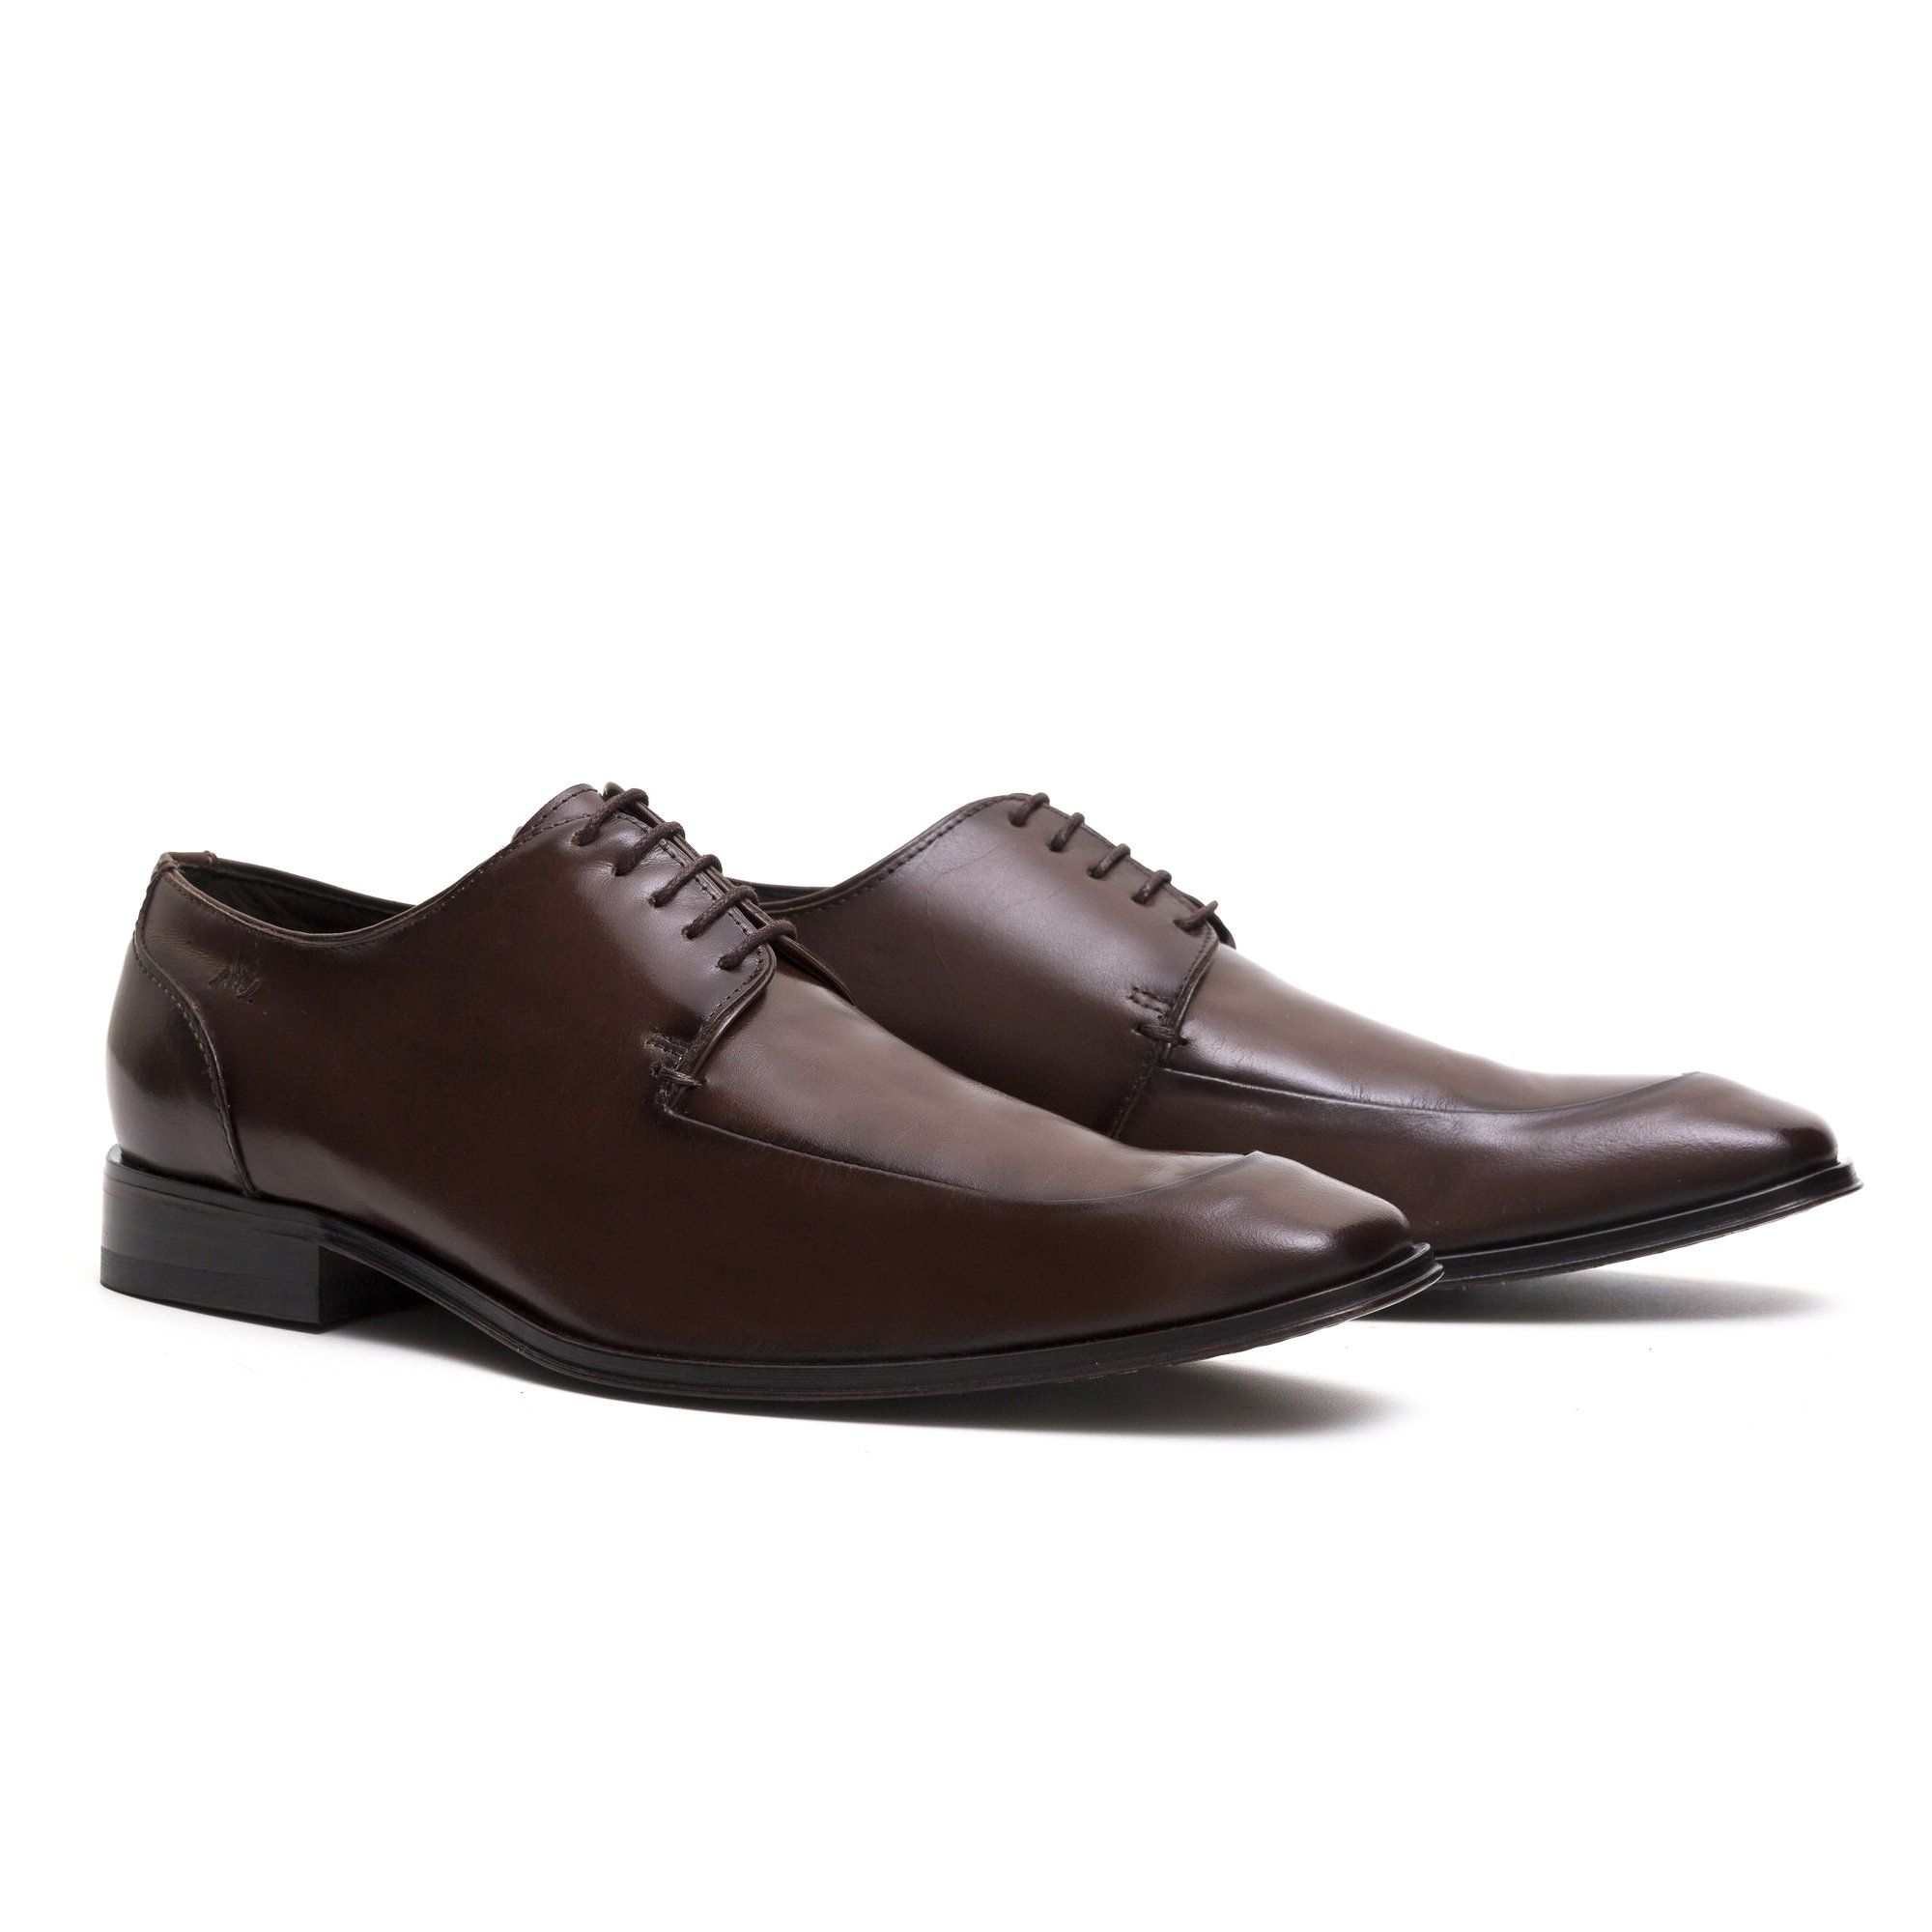 Sapato Social Masculino Derby Marrom Couro Legítimo Monbran Dressy 057590M